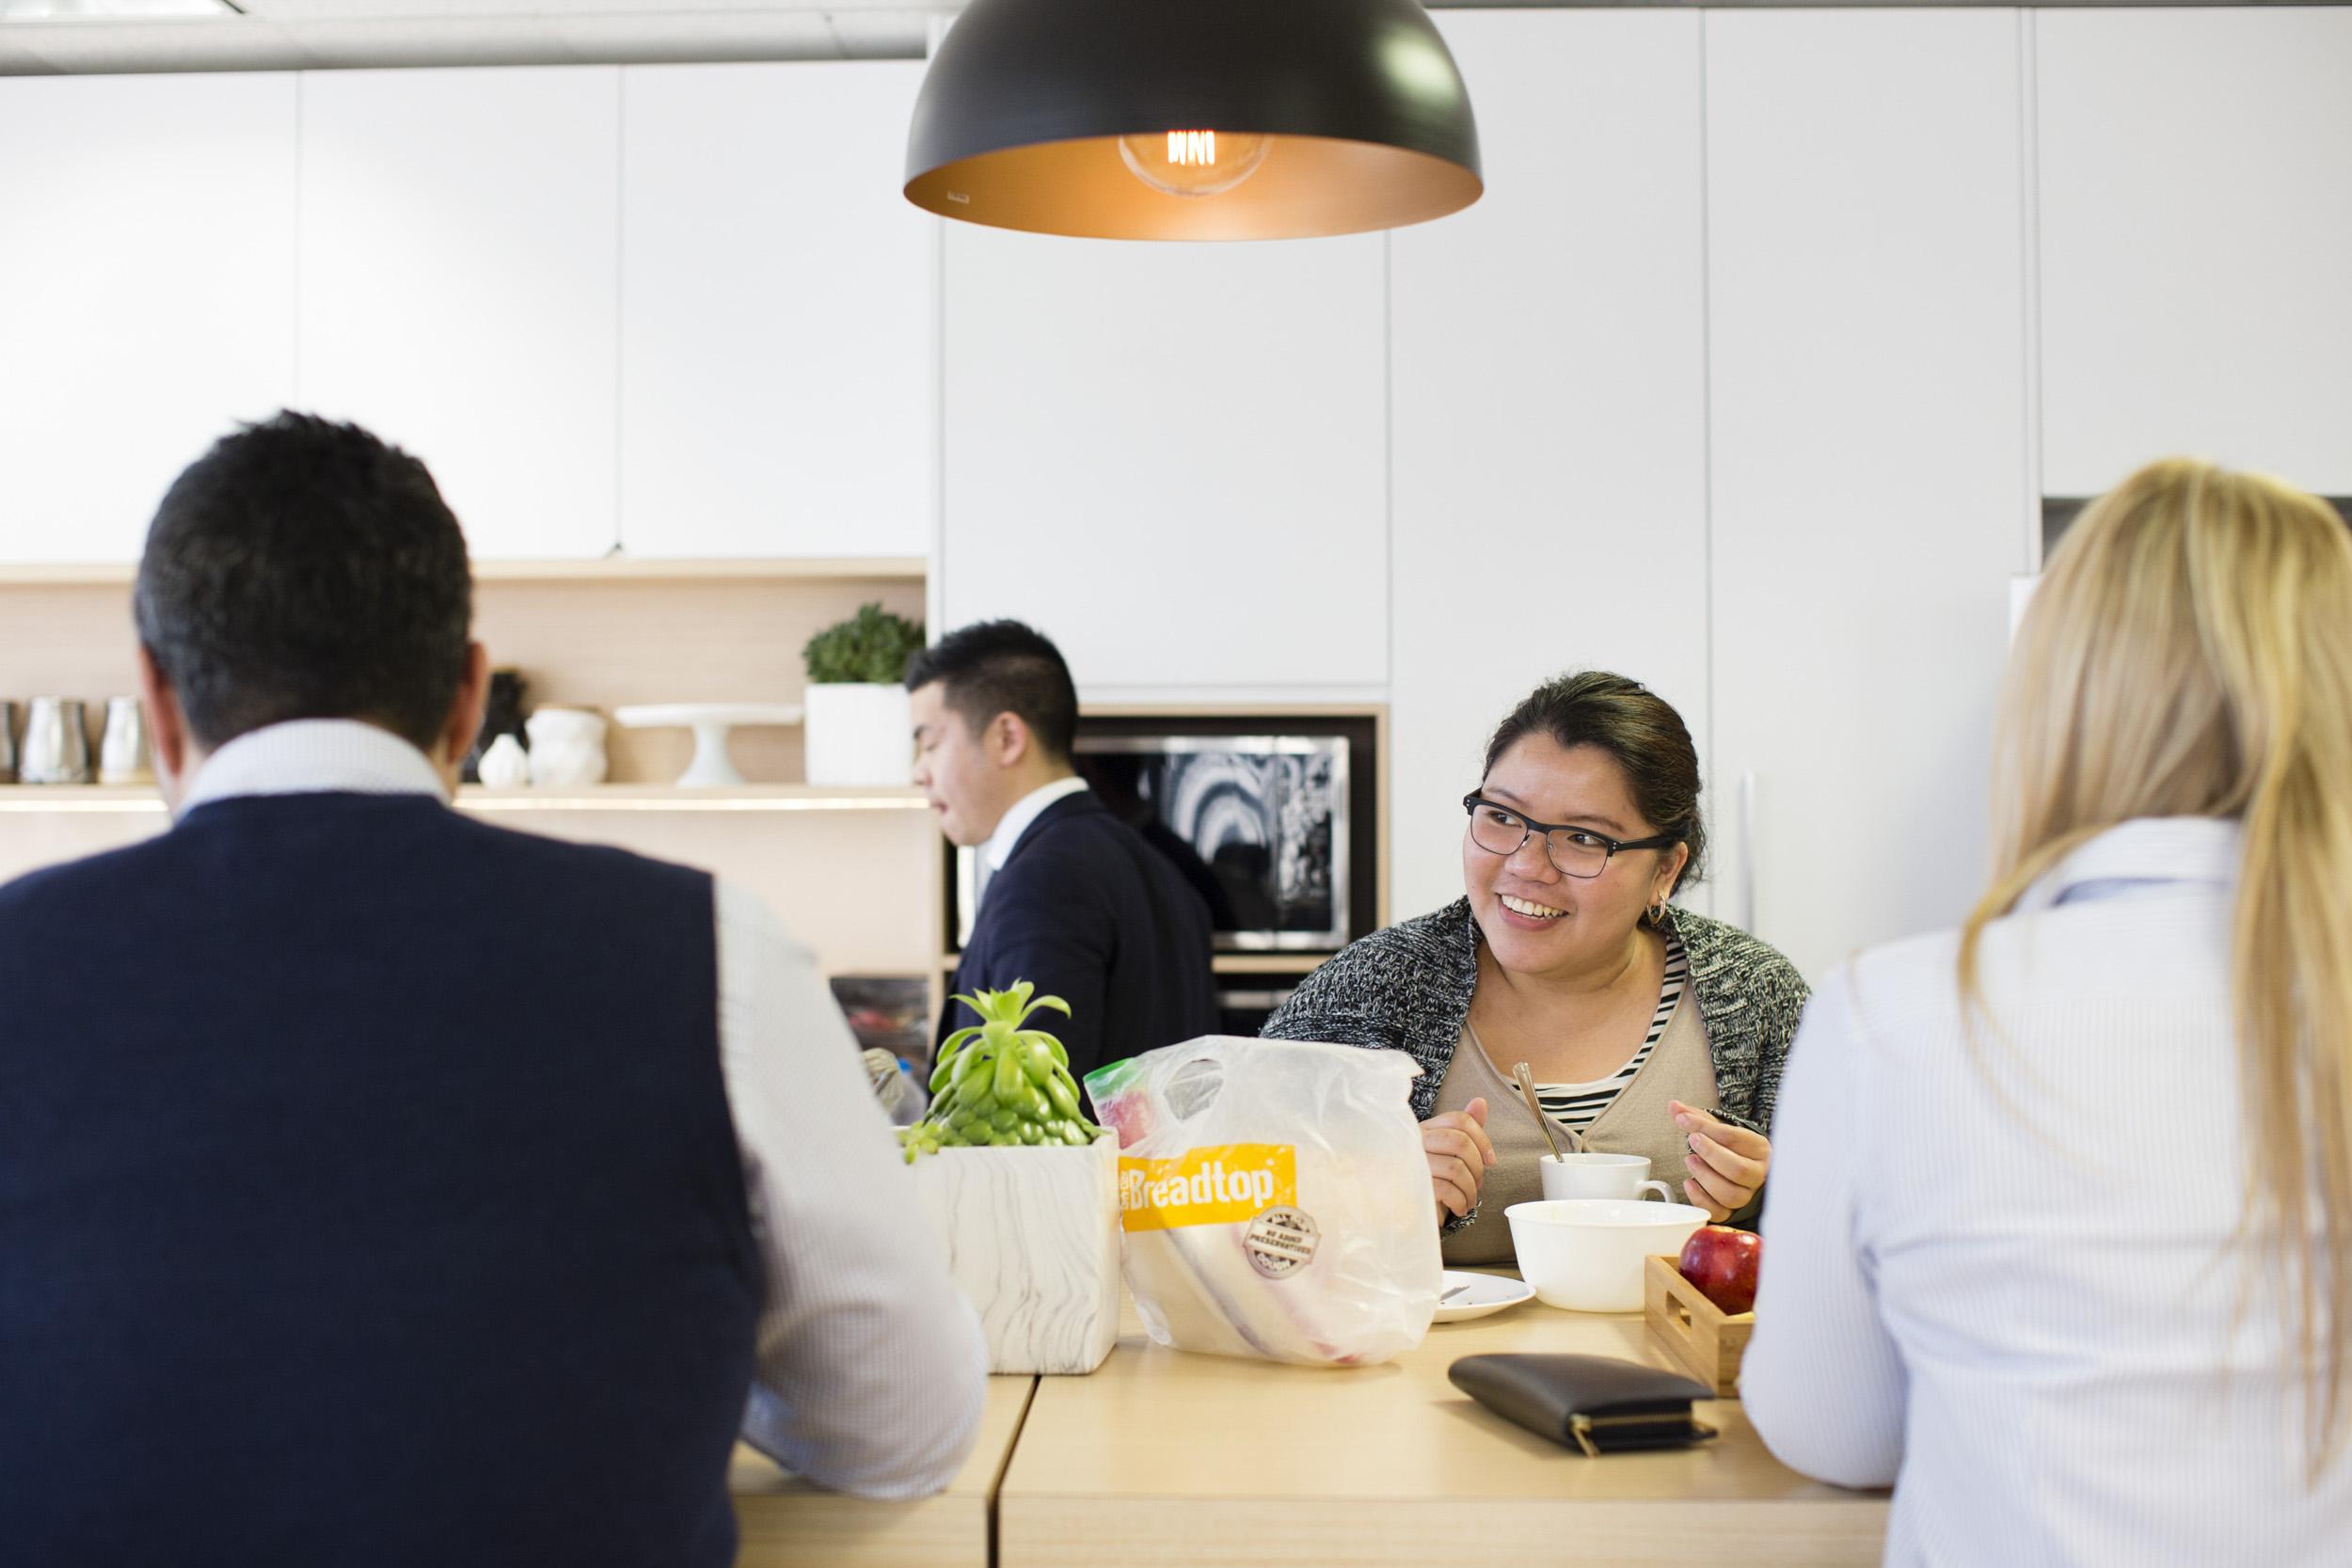 workplace-staff-portraits-Sydney-Australia_06.jpg